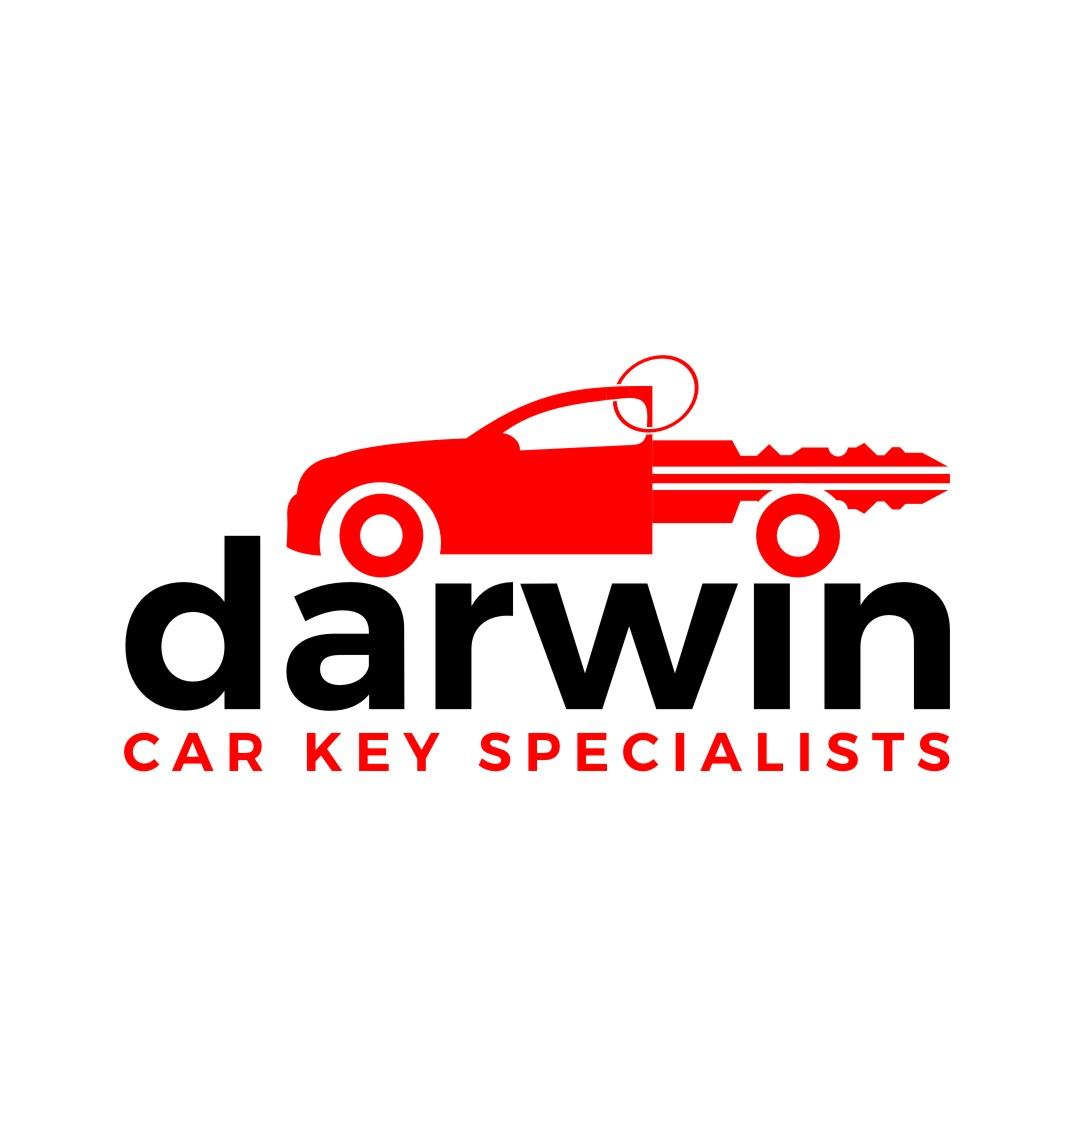 Professional Masculine Automotive Logo Design For Darwin Car Key Specialists By Hih7 Design 11906521